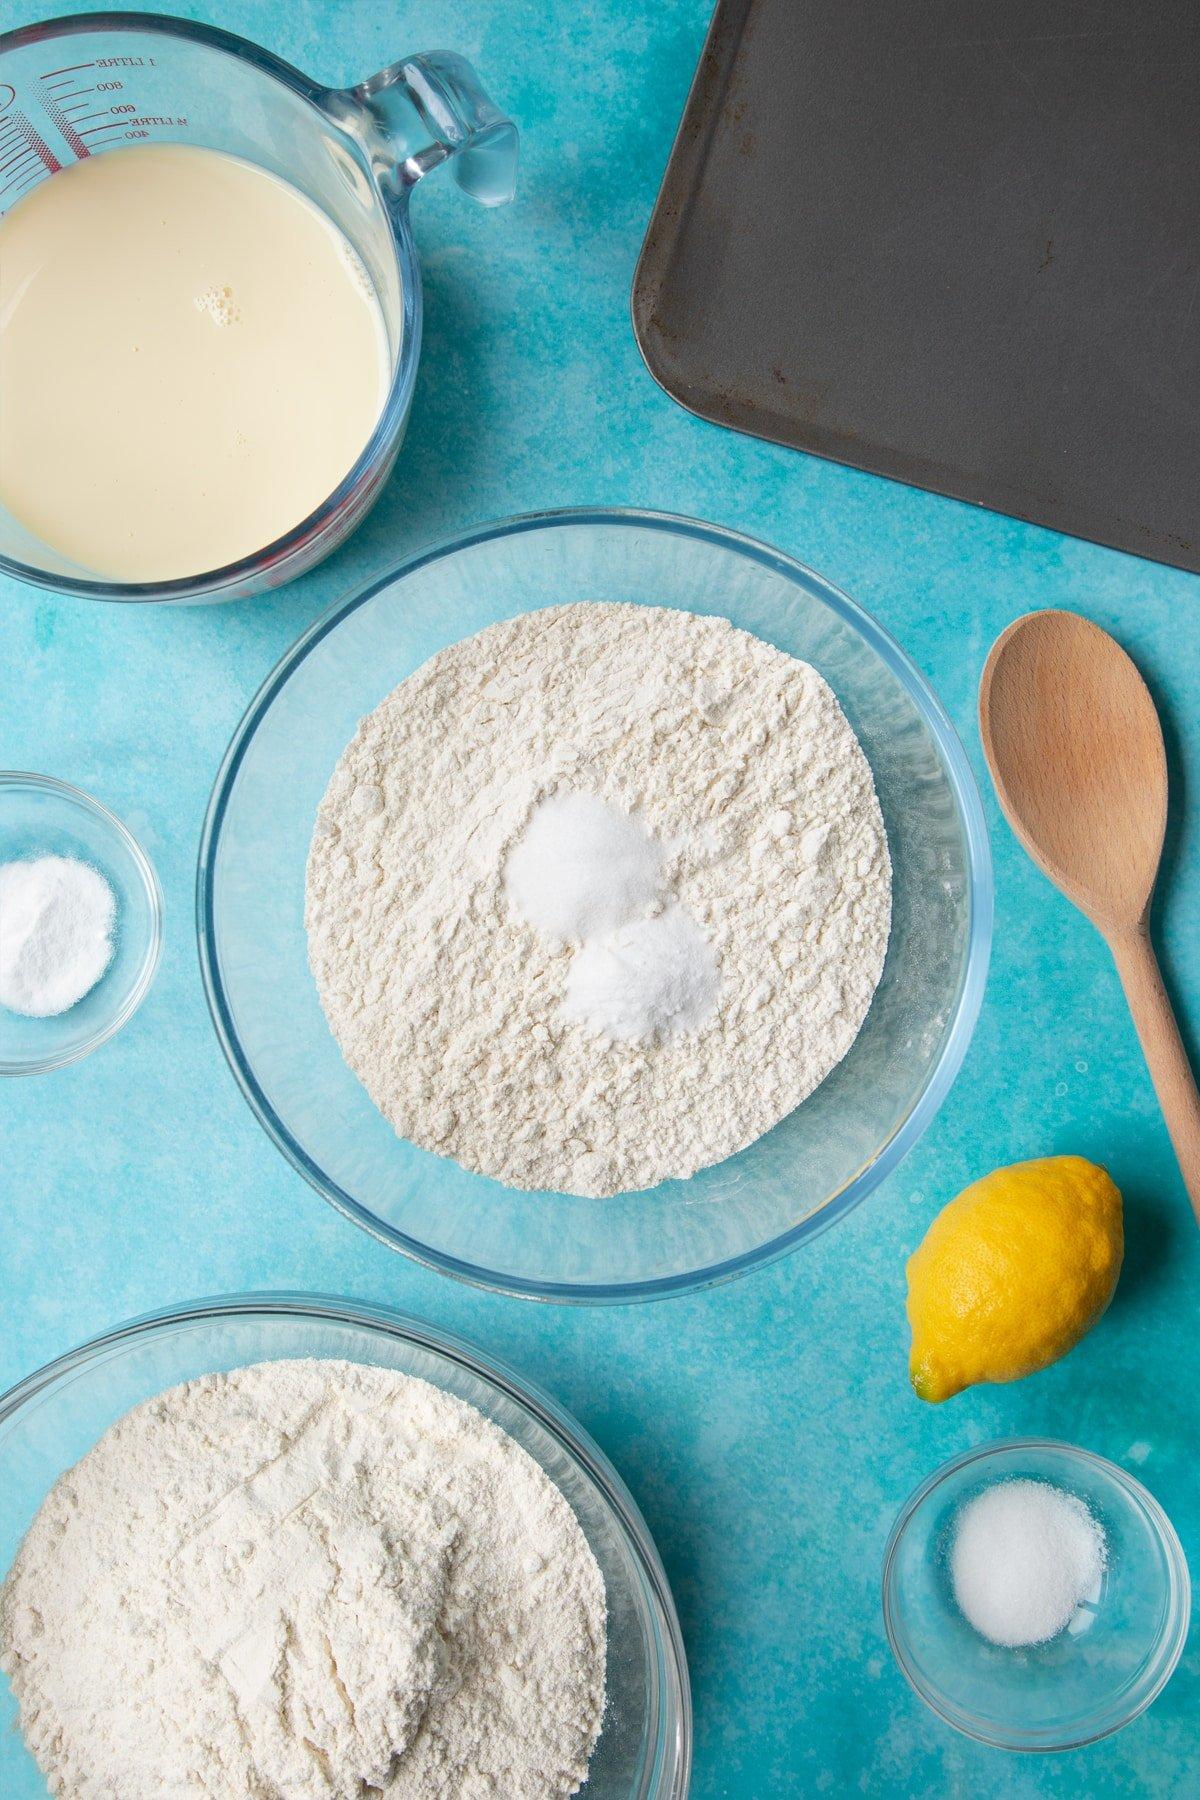 A bowl containing plain flour, salt and bicarbonate of soda. Ingredients to make vegan soda bread surround the bowl.